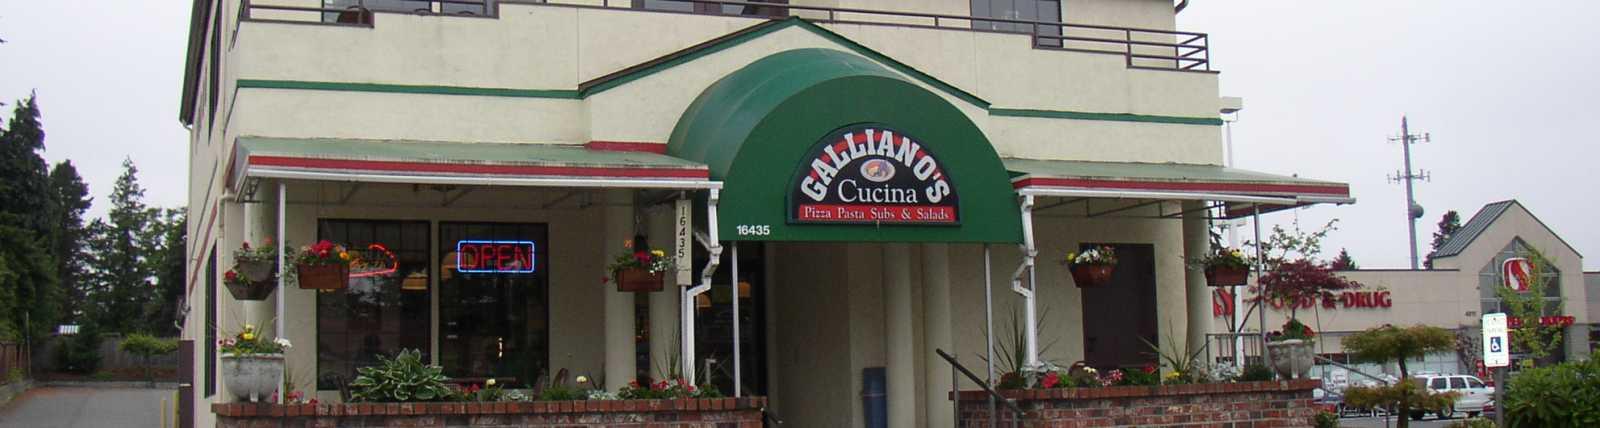 Galliano's